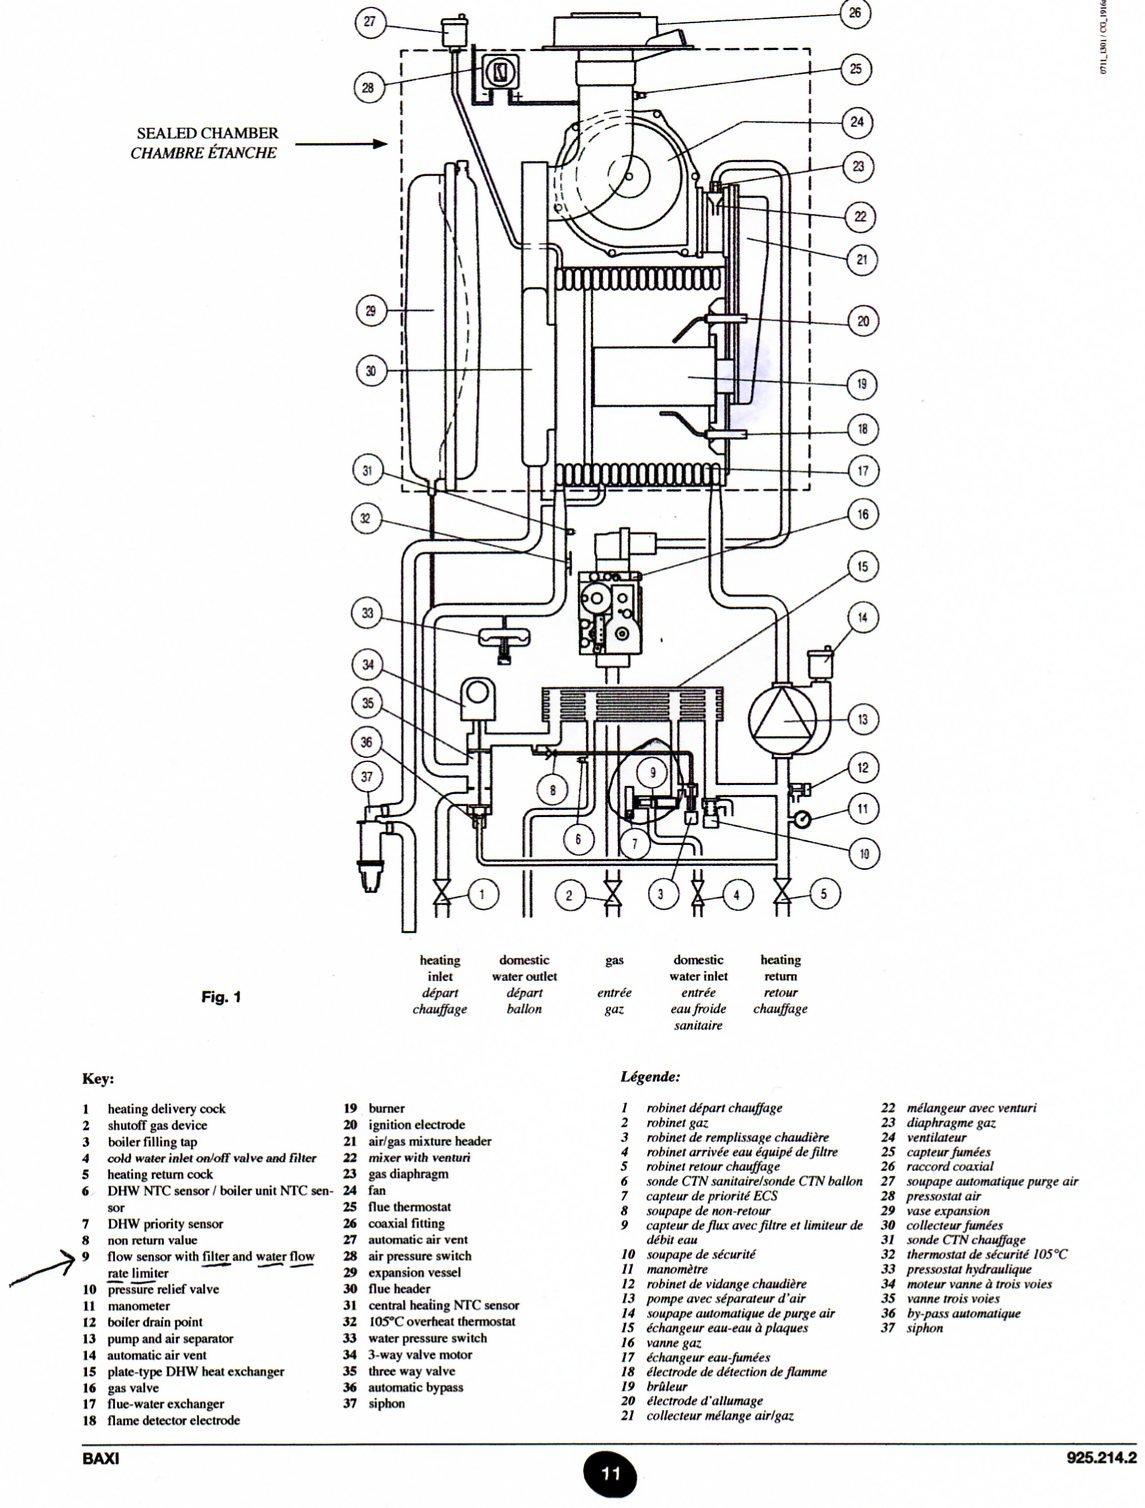 columbia step ballast wiring diagram c9d17 baxi luna ht 330 manual wiring library  c9d17 baxi luna ht 330 manual wiring